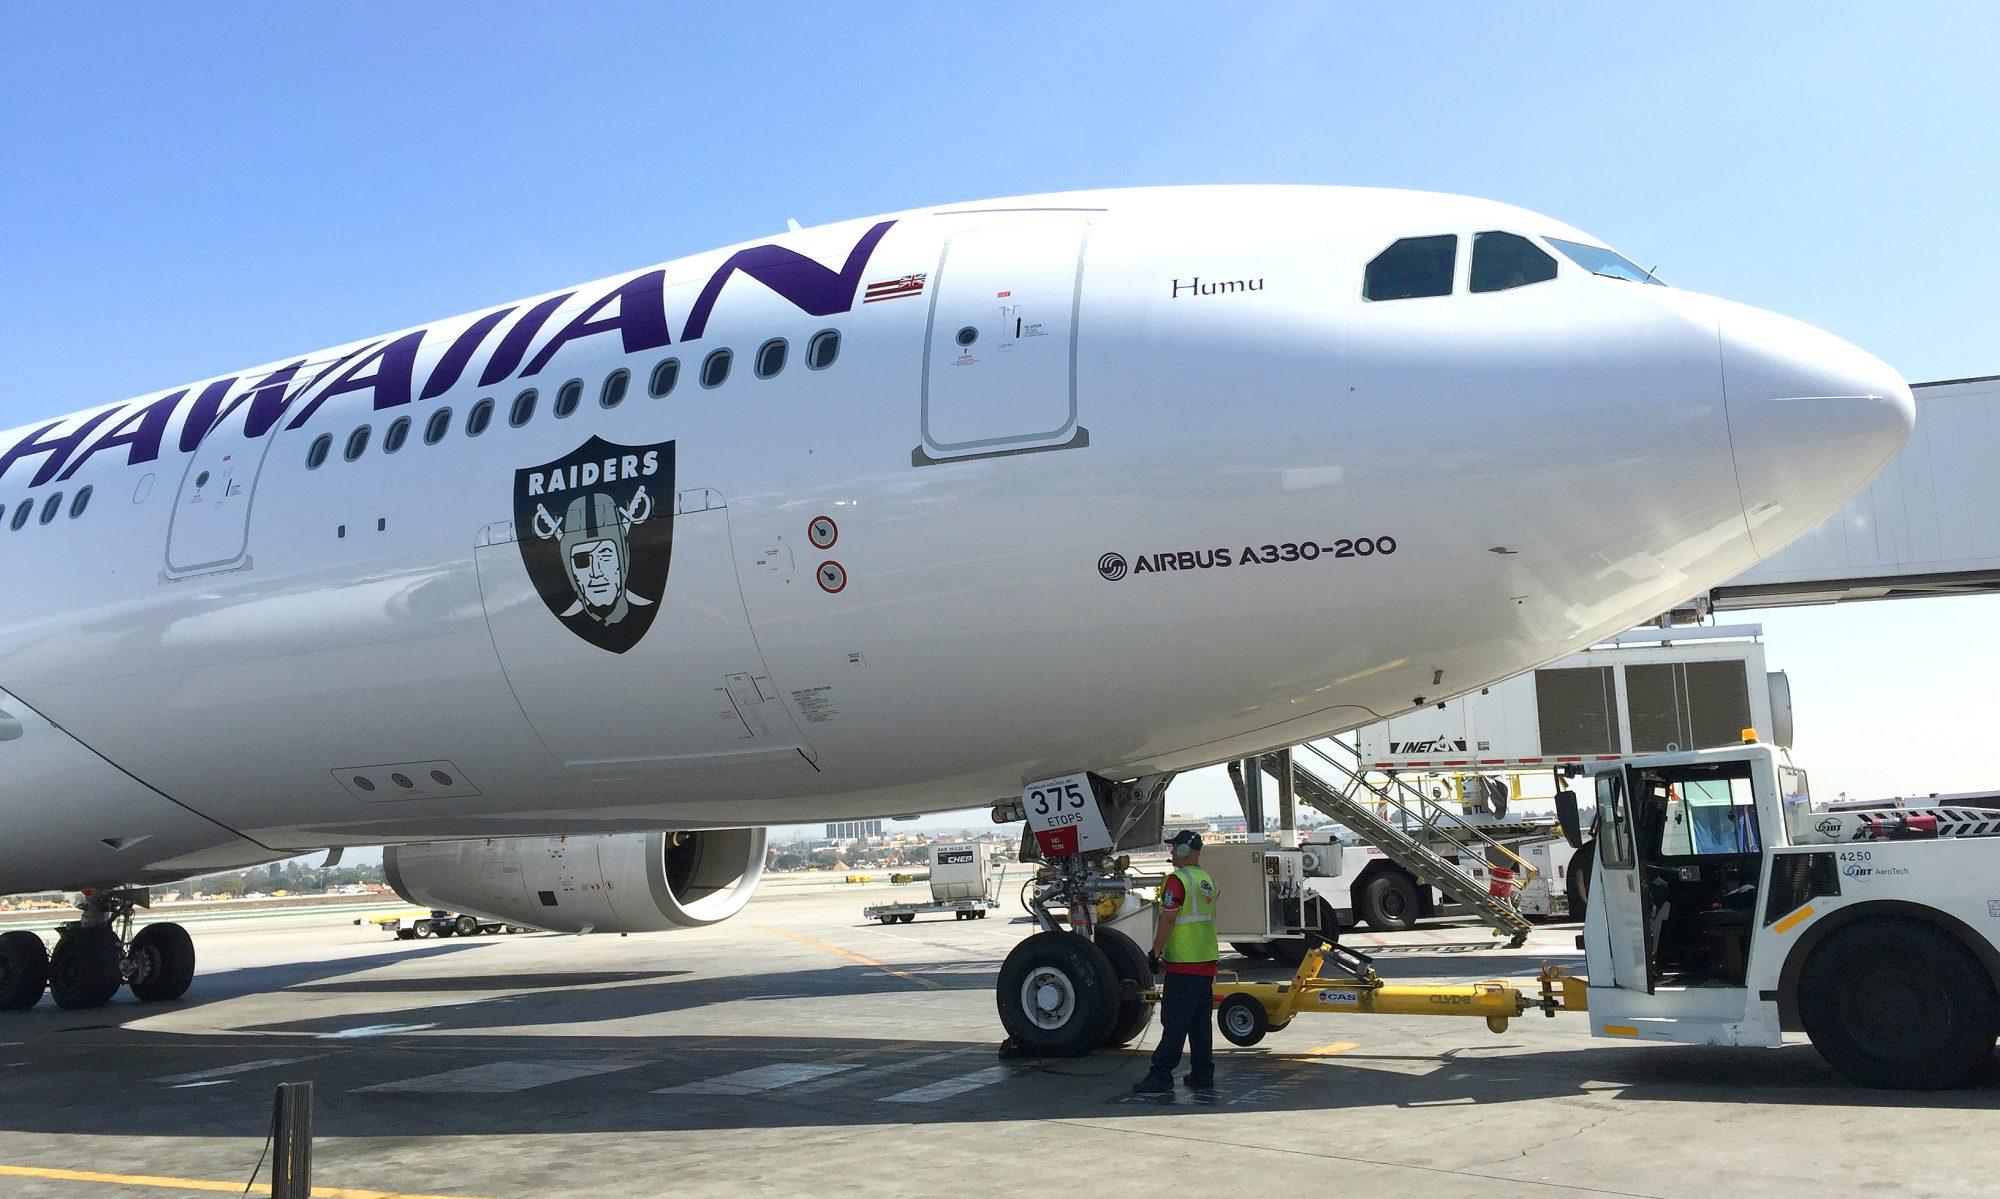 DuFay Aviation Management